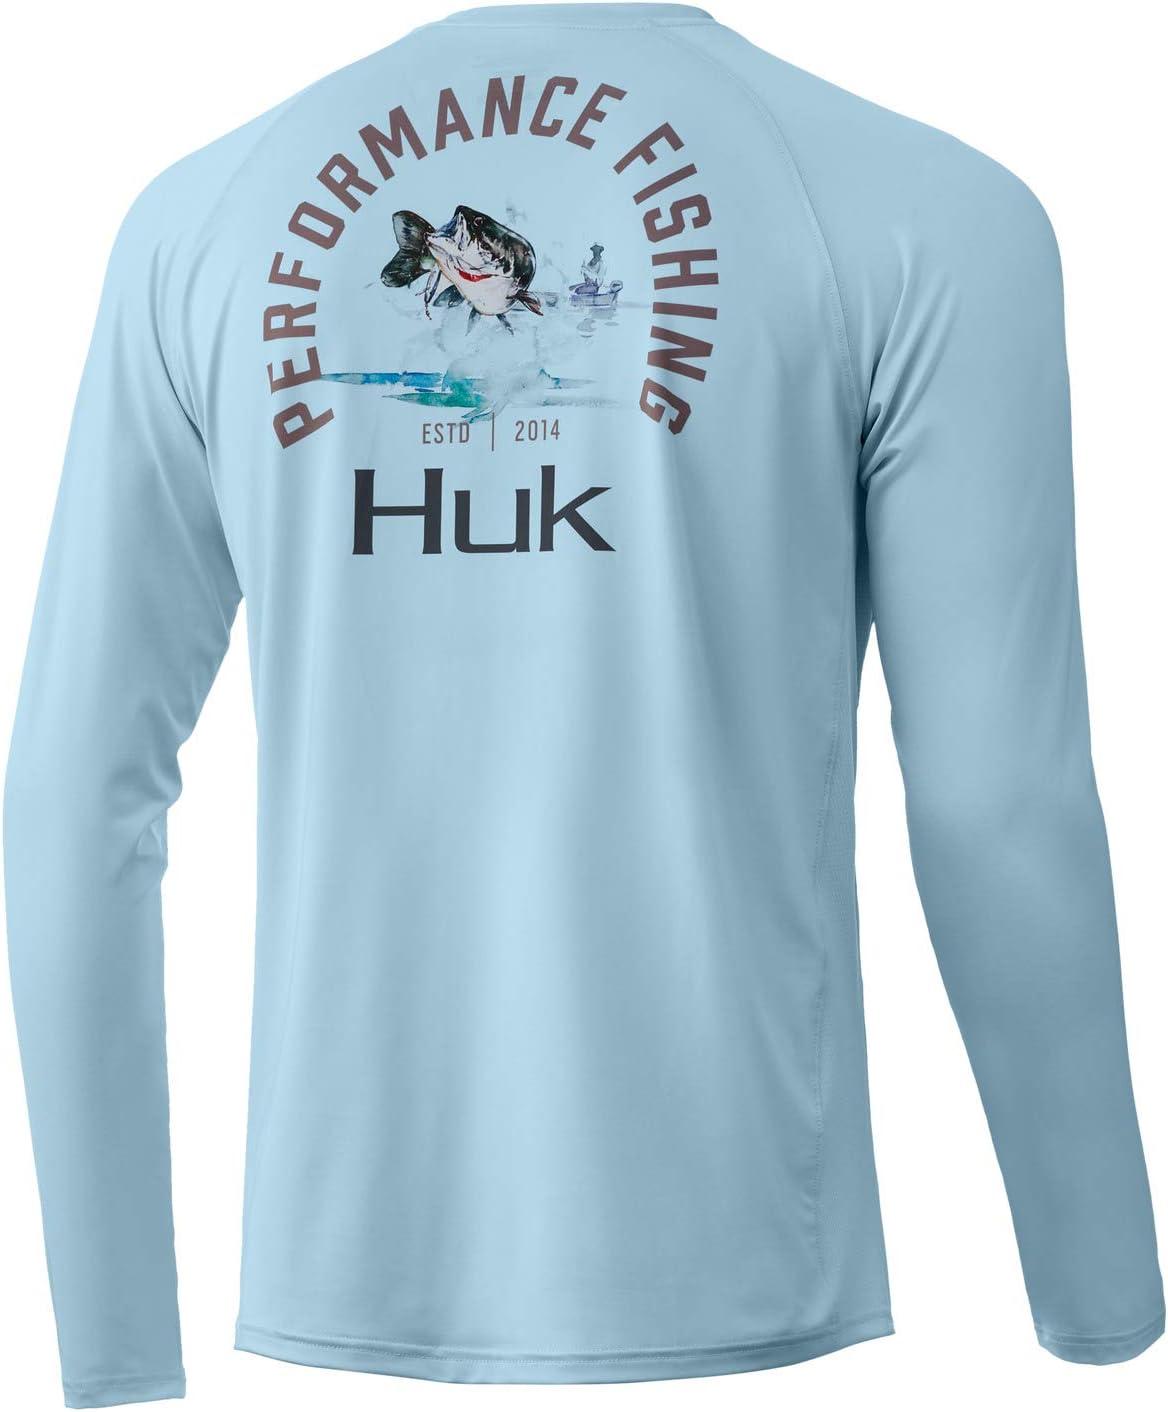 OFFicial store store HUK Men's Pursuit Long Sleeve Fishing Shirt Bass Protecting Sun